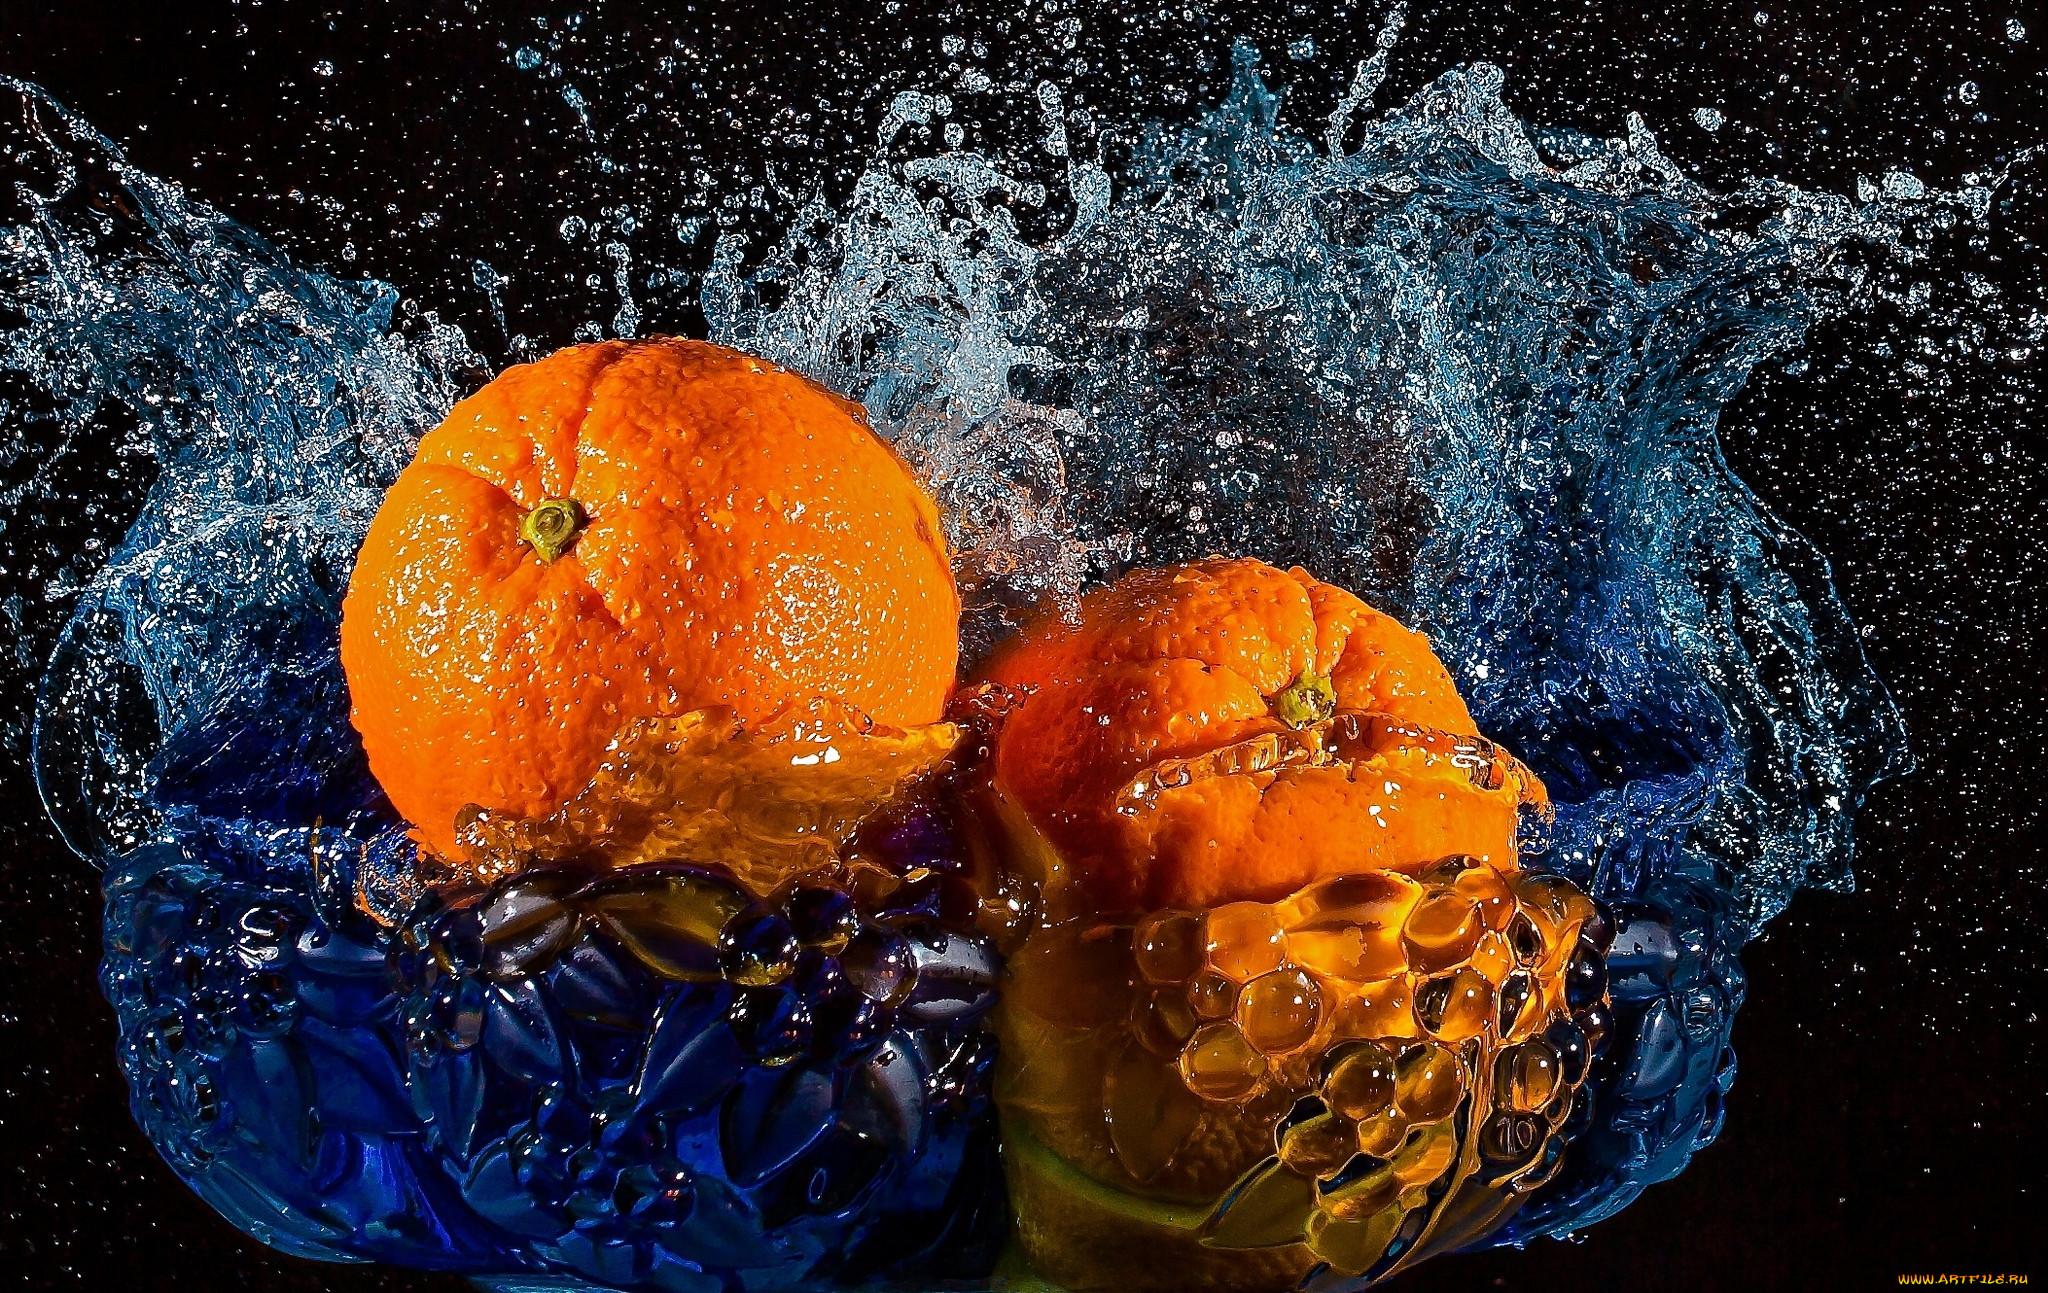 урок красивые картинки на рабочий стол апельсин артист